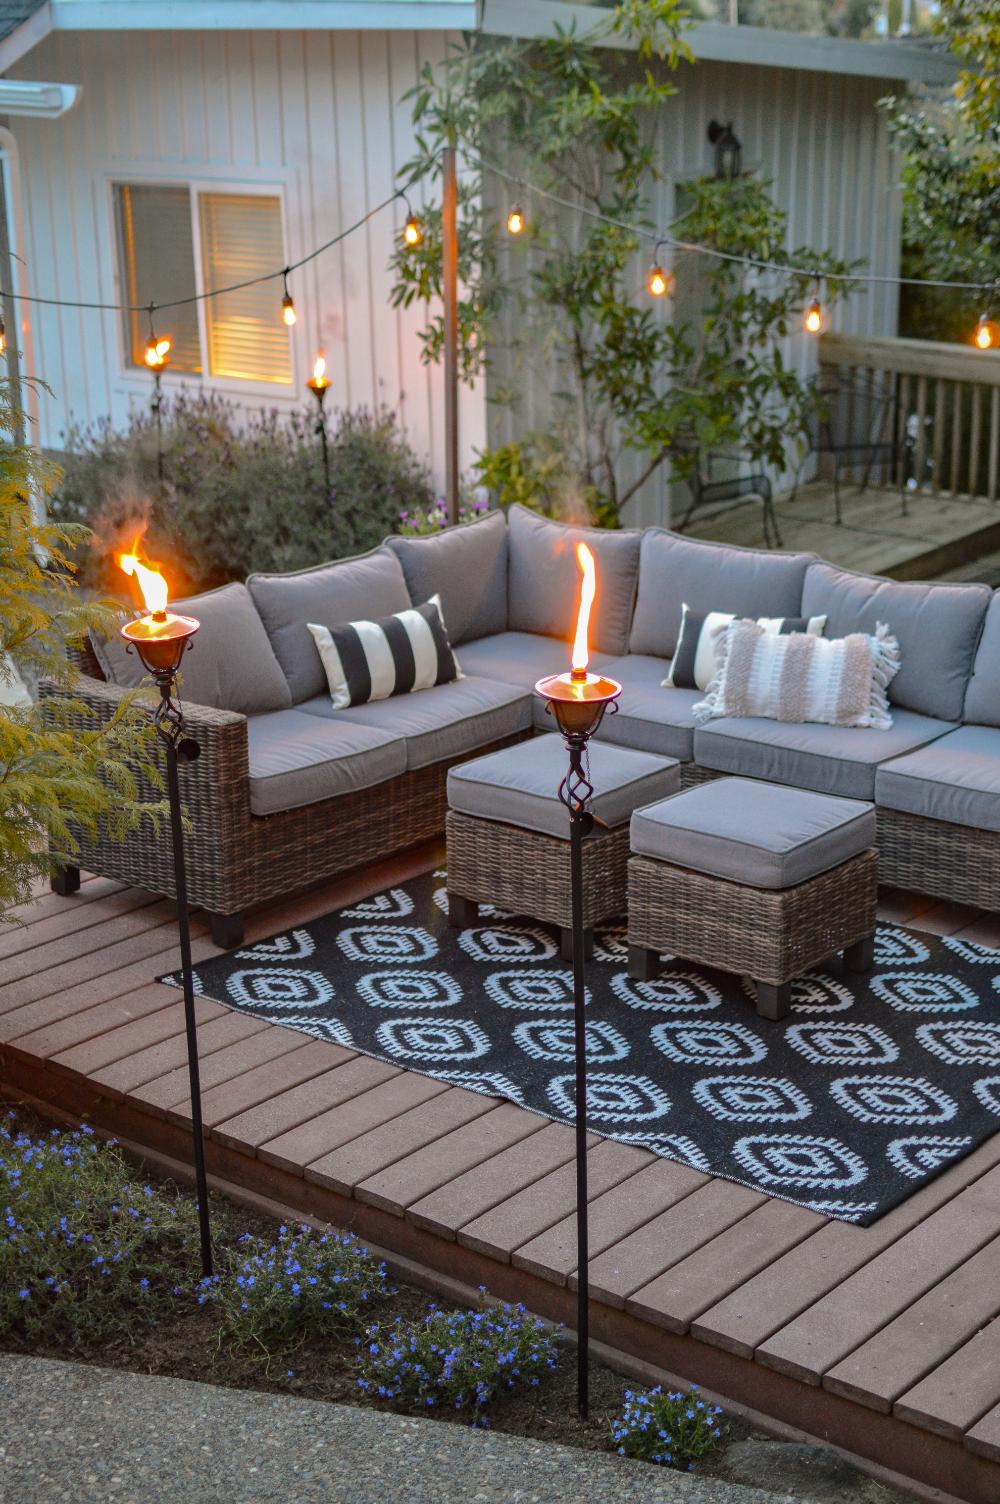 1a76ea8ac081e471c036162884635b7f - Better Homes And Gardens Diy Furniture